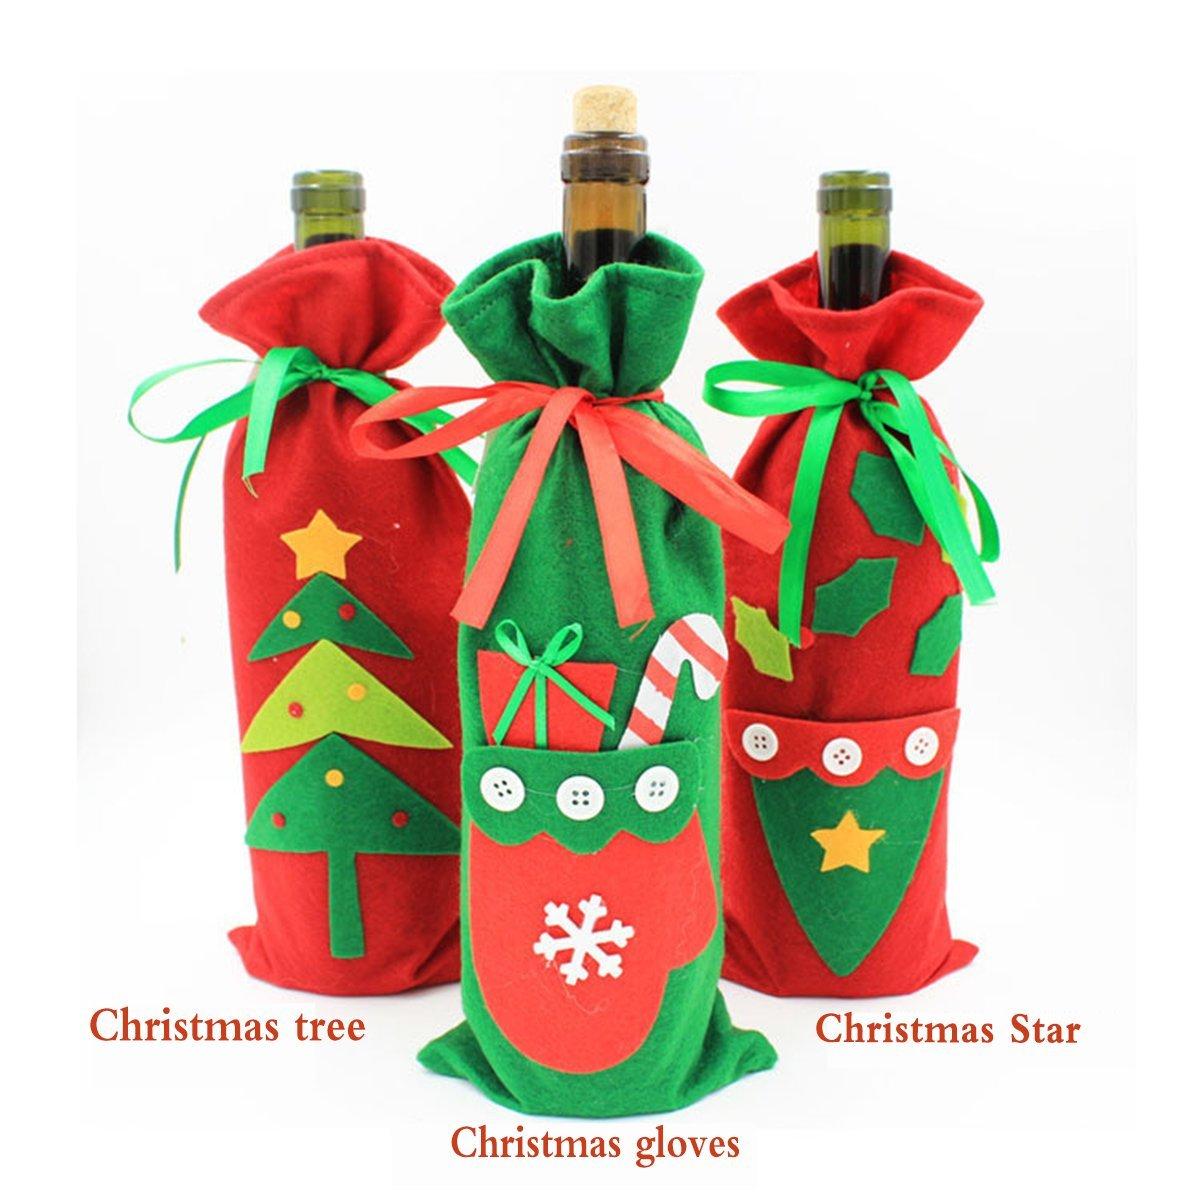 ISNOWKING 3Pcs Santa Claus Wine Bottle Cover Red Wine Bags Christmas Wine Bottle Gift Bags Set (Style2(3pcs))